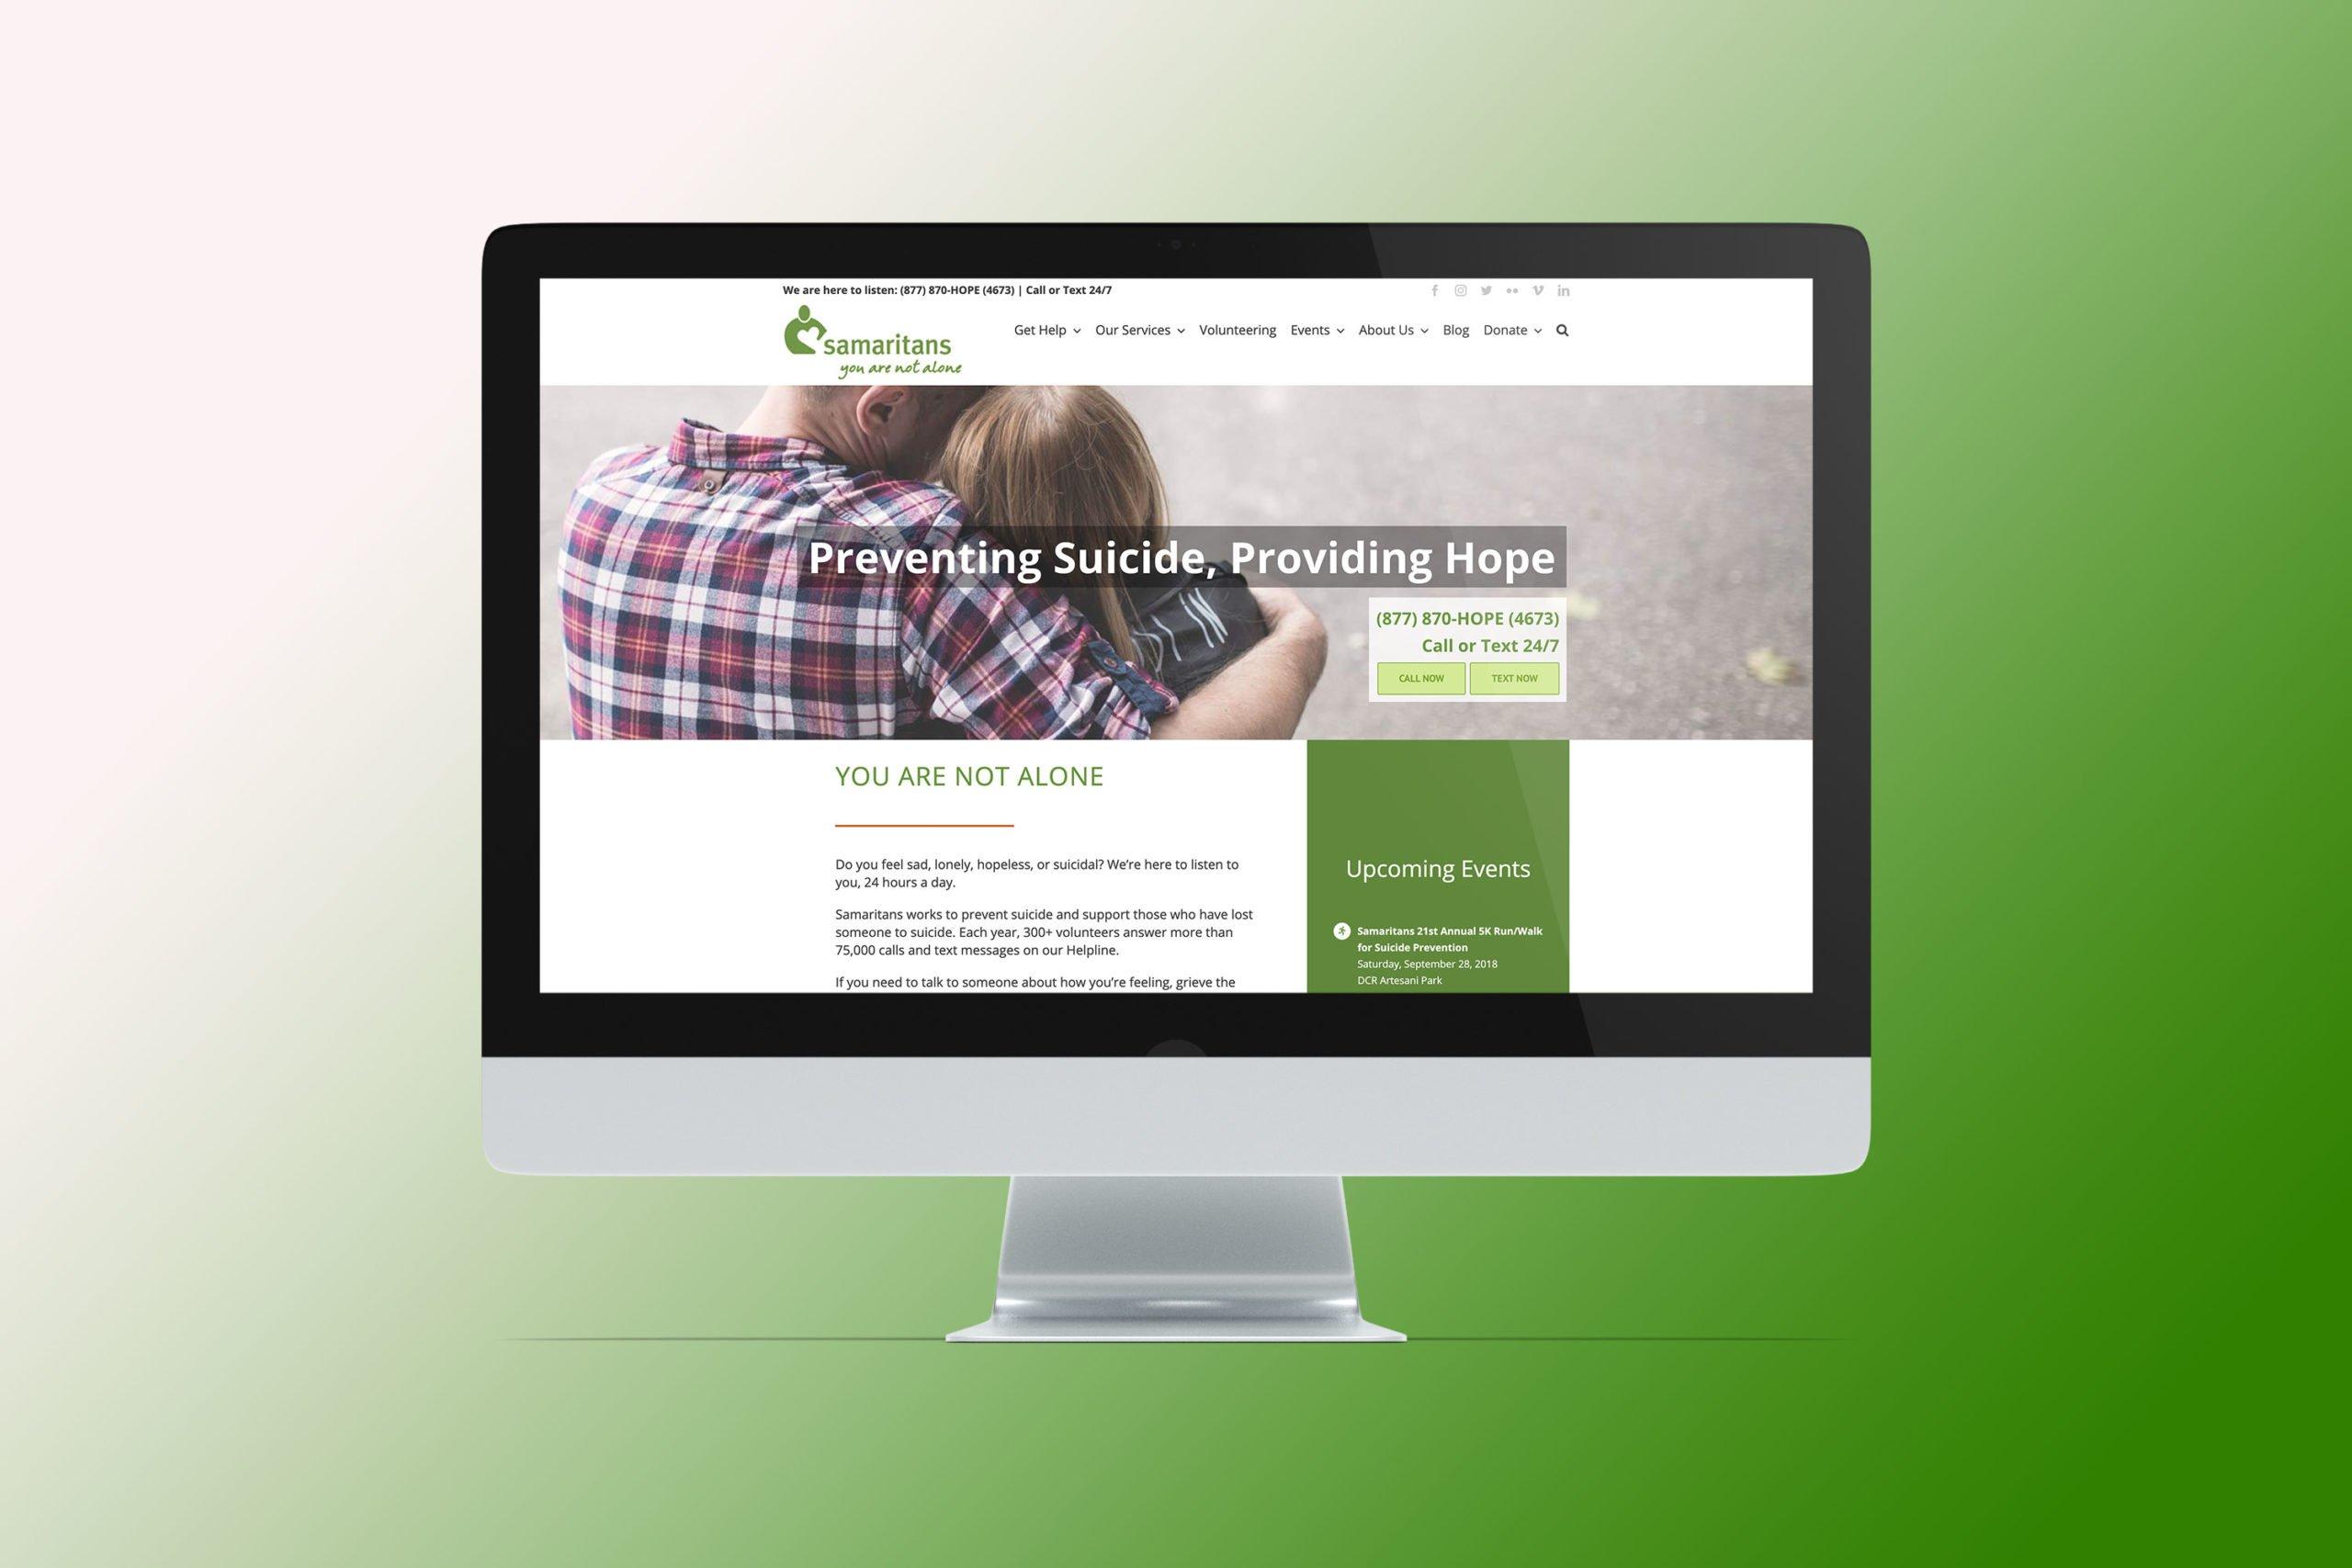 desktop view of the old samaritans website